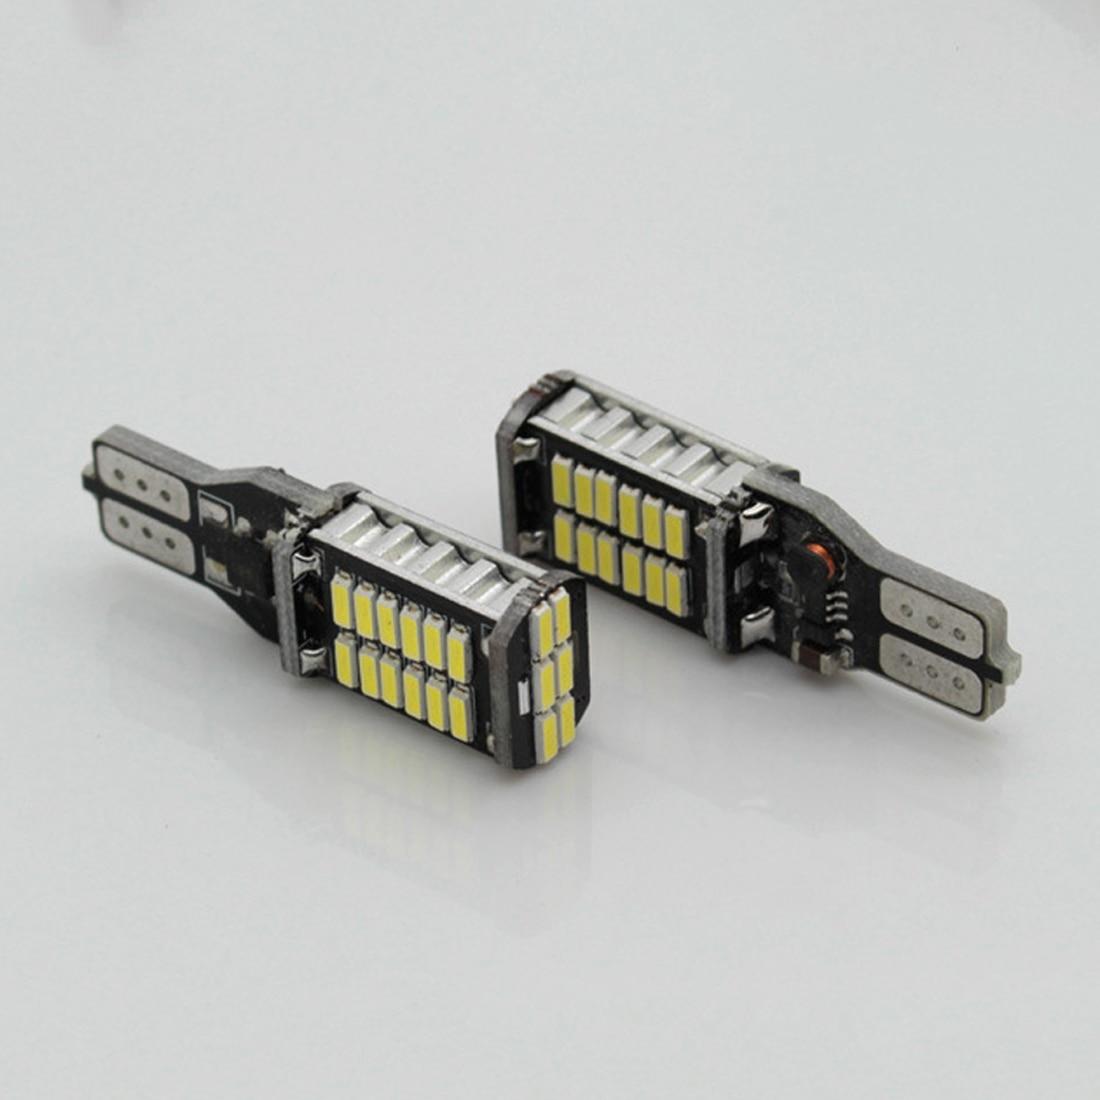 RF-M183-5 5-Pack TS9 Male Plug to SMA Female Jack Gold-Plated RF Adapter